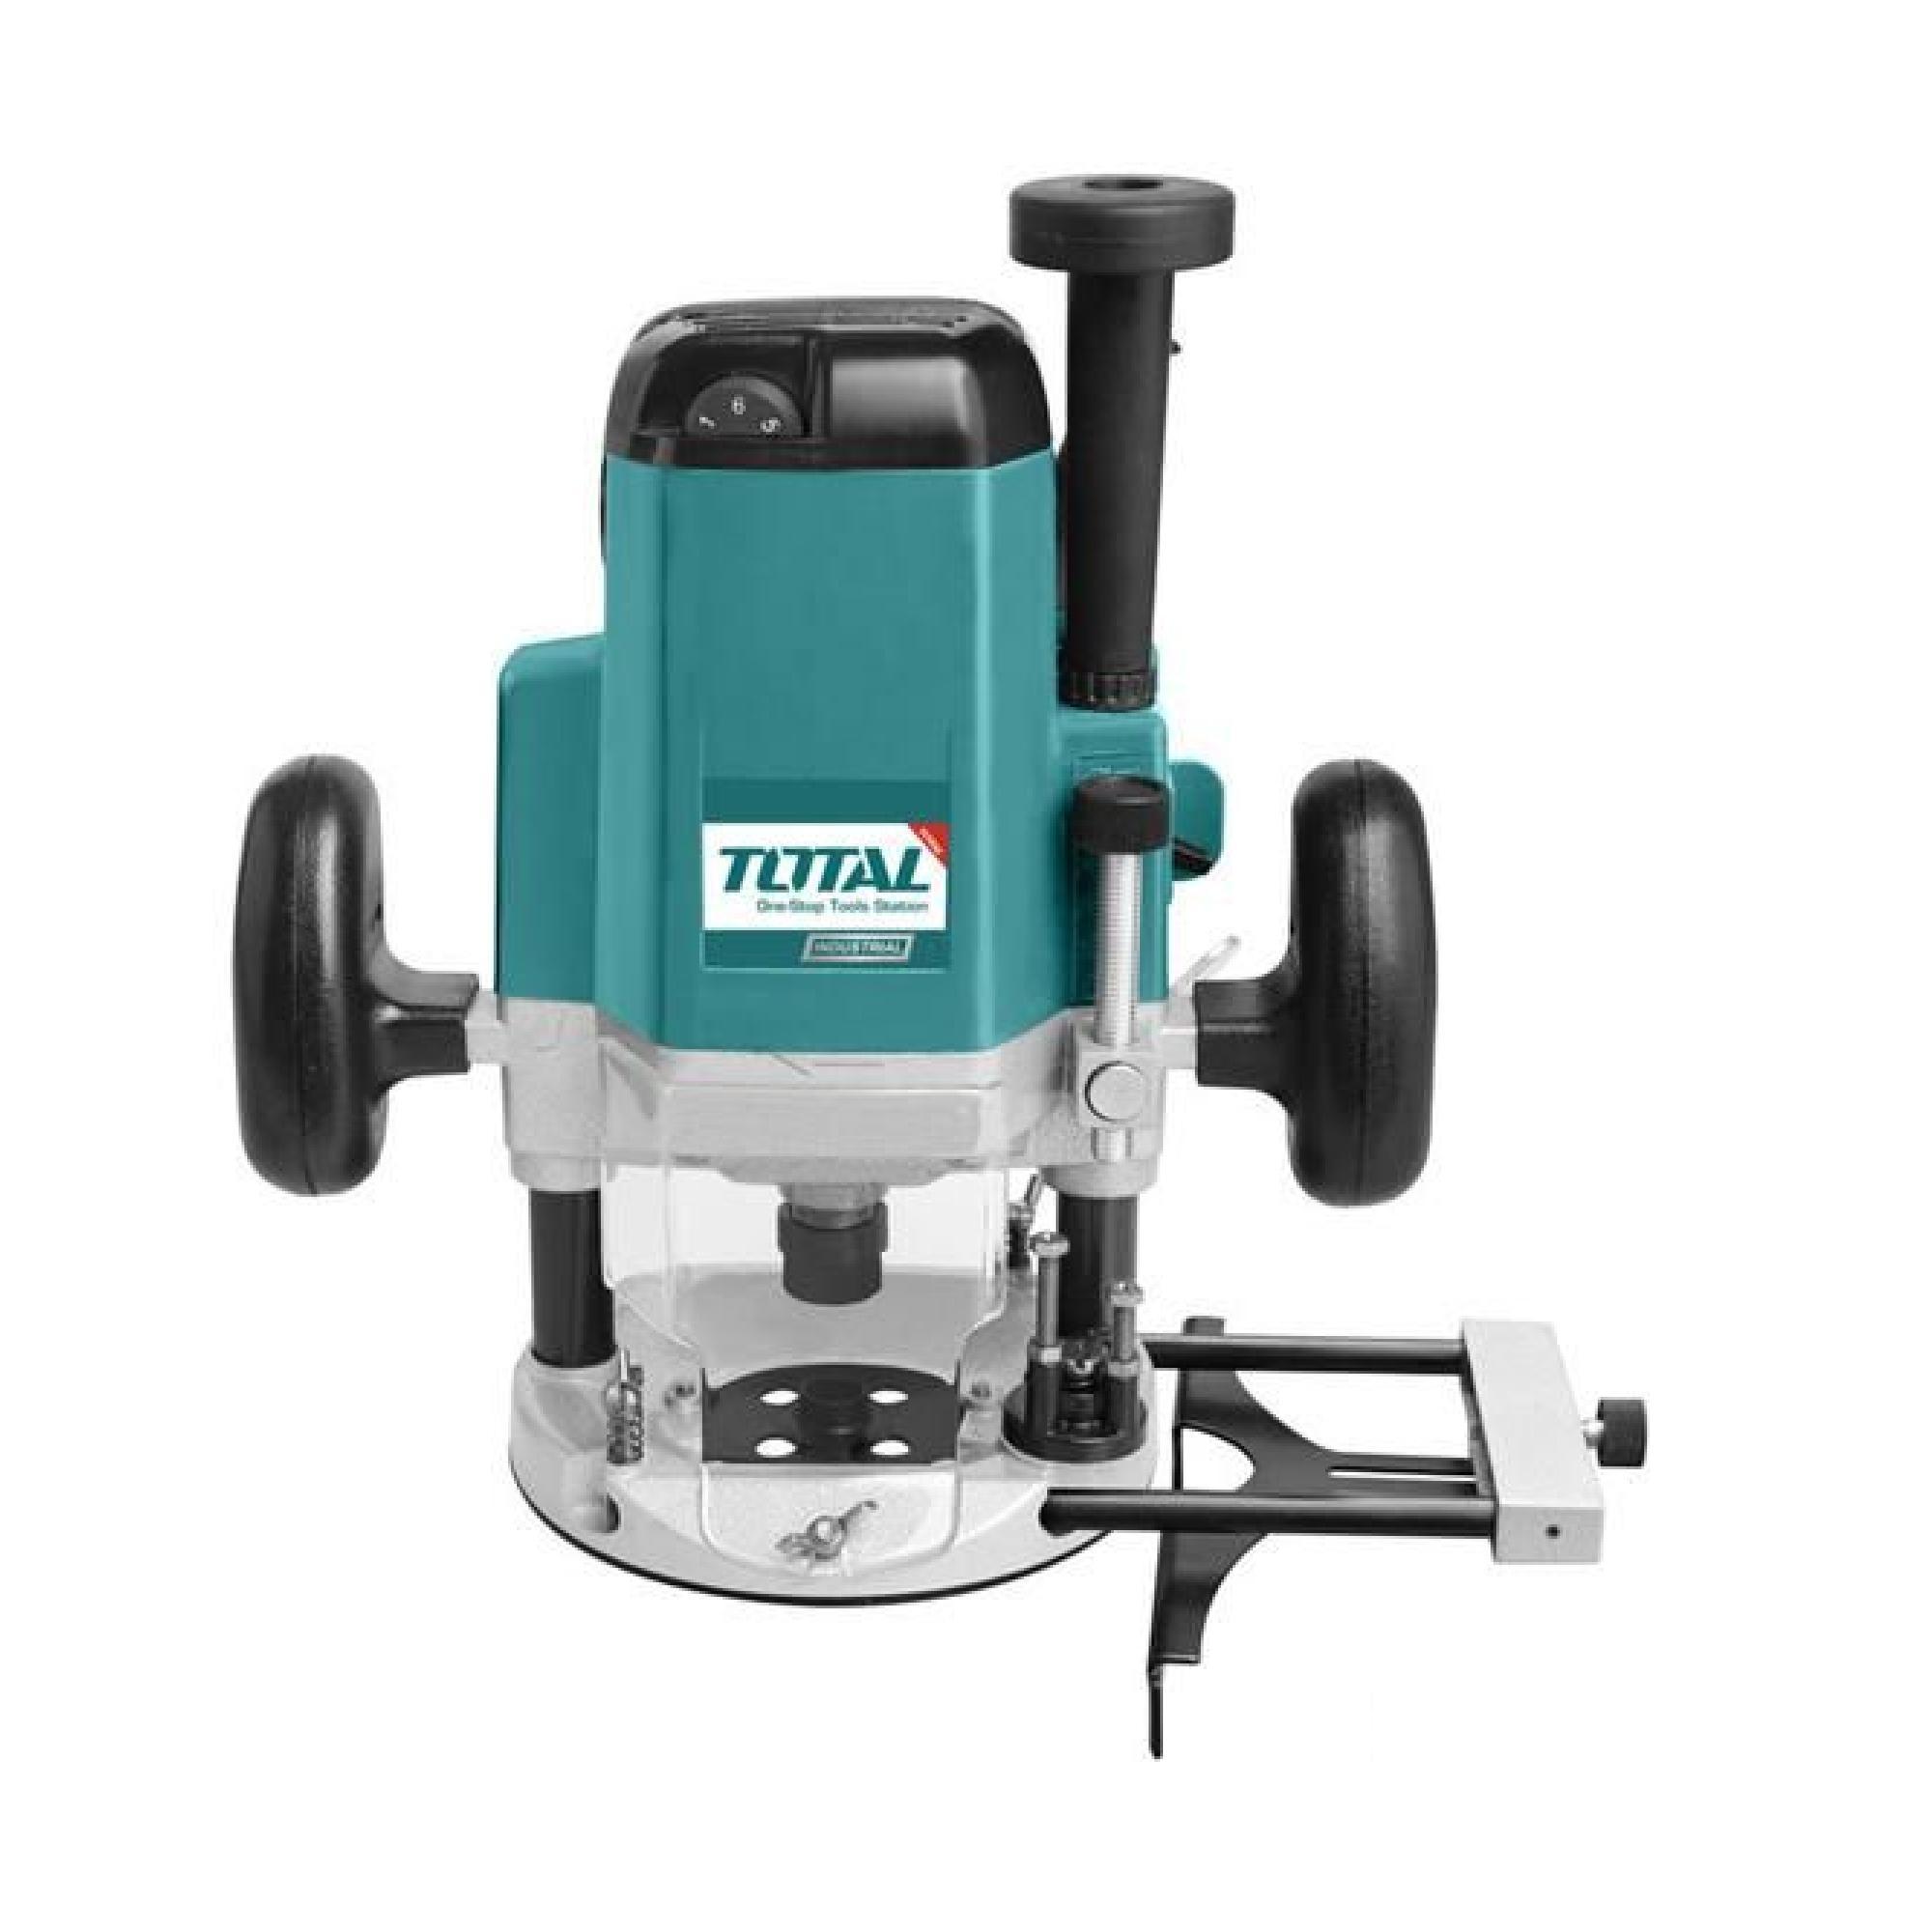 12MM - 2200W MÁY PHAY GỖ TOTAL - TR11122